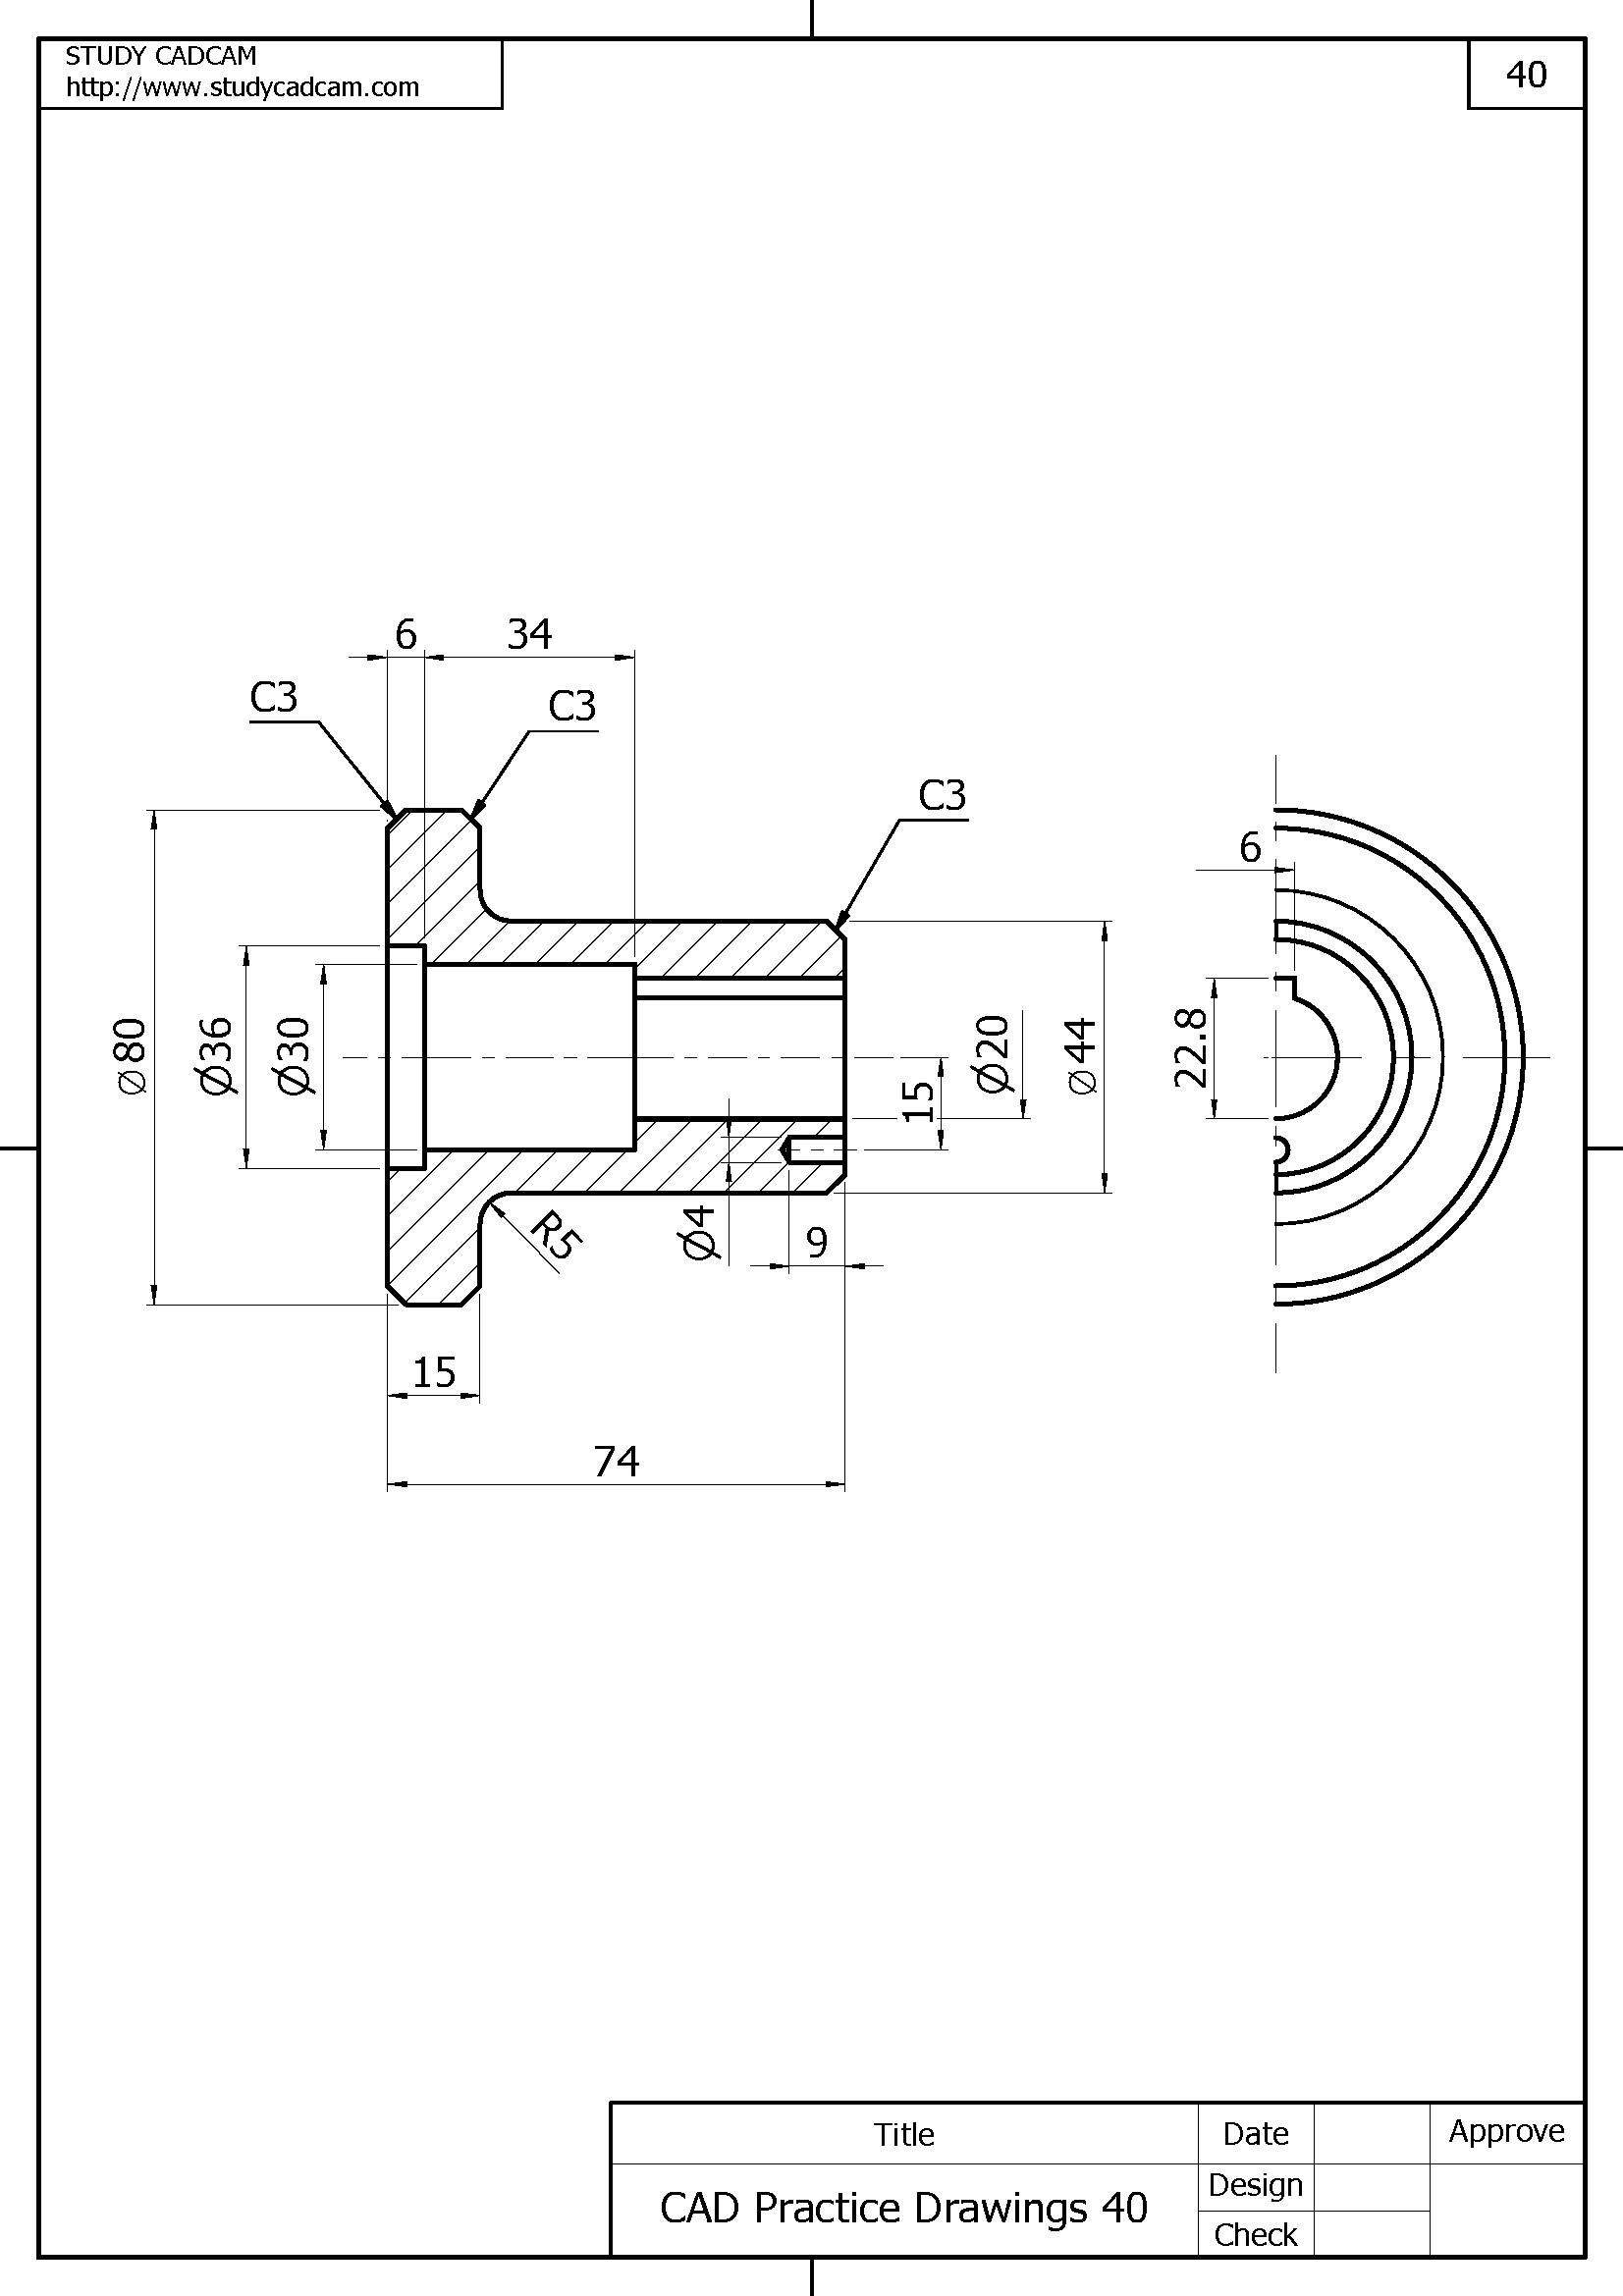 basic wiring diagram symbols Download-Cad Wiring Diagram Symbols Fresh Mechanical Engineering Diagrams Hvac Diagram Best Hvac Diagram 0d 16-o